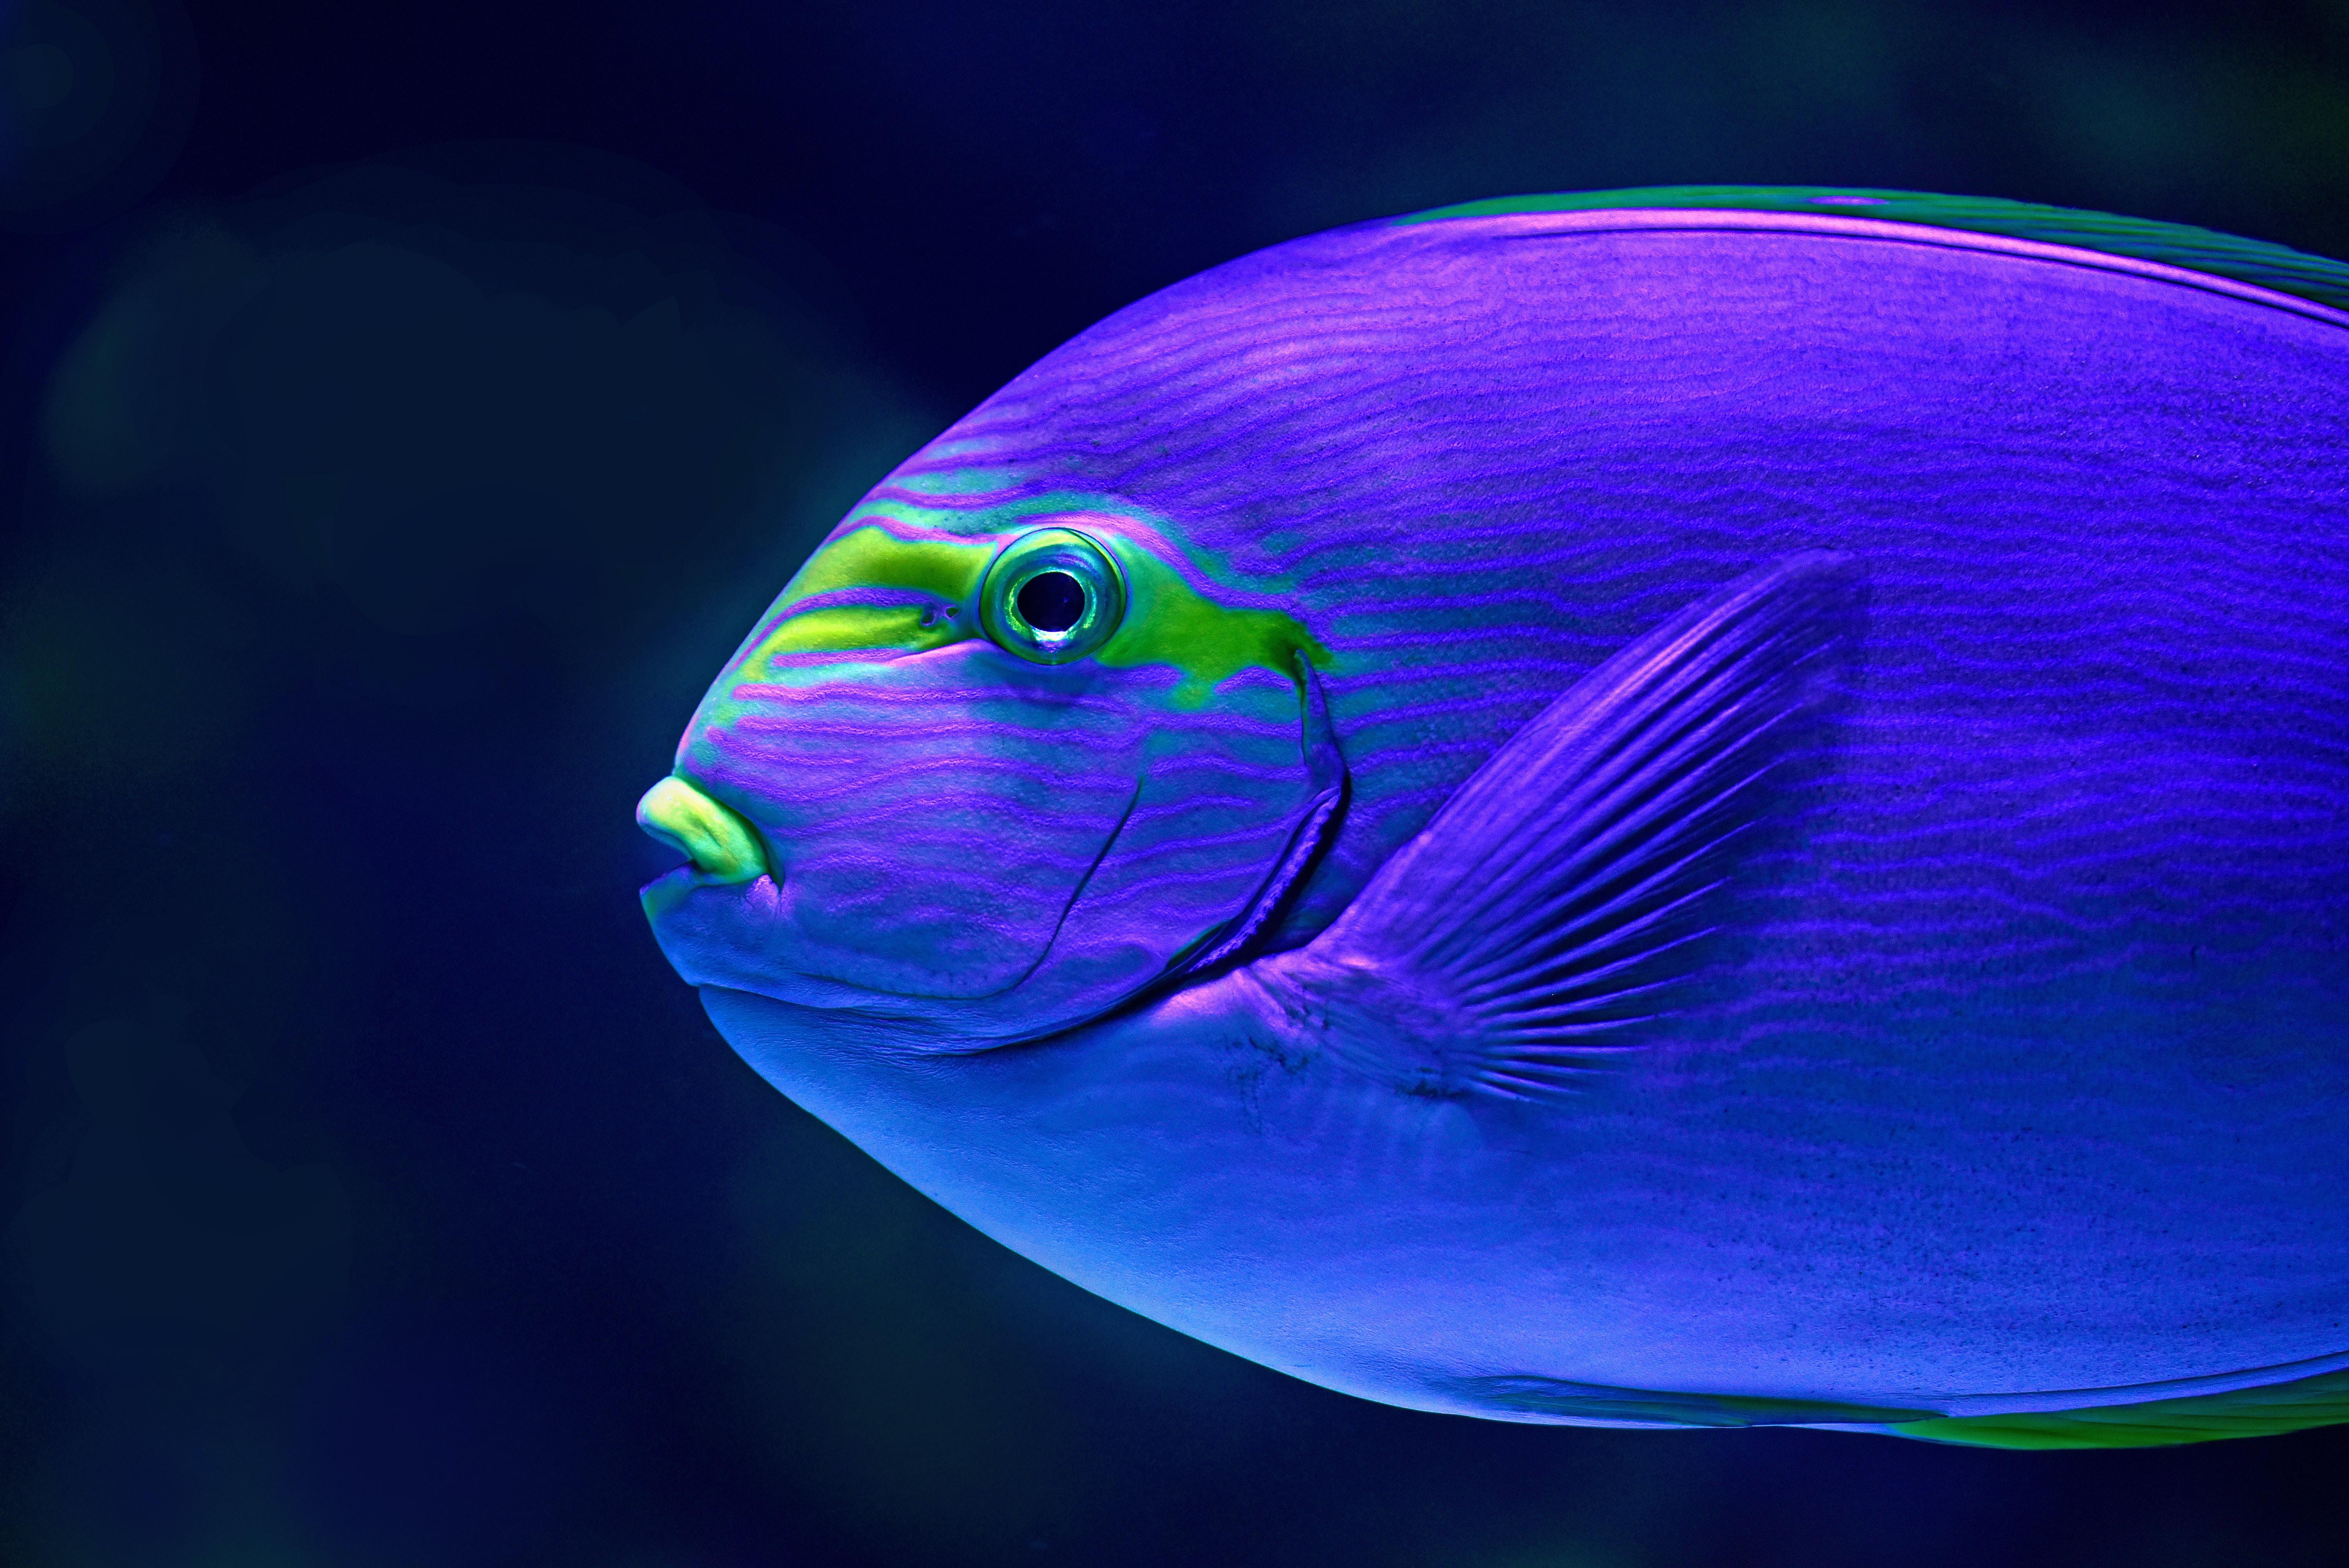 close-up photo of blue fish